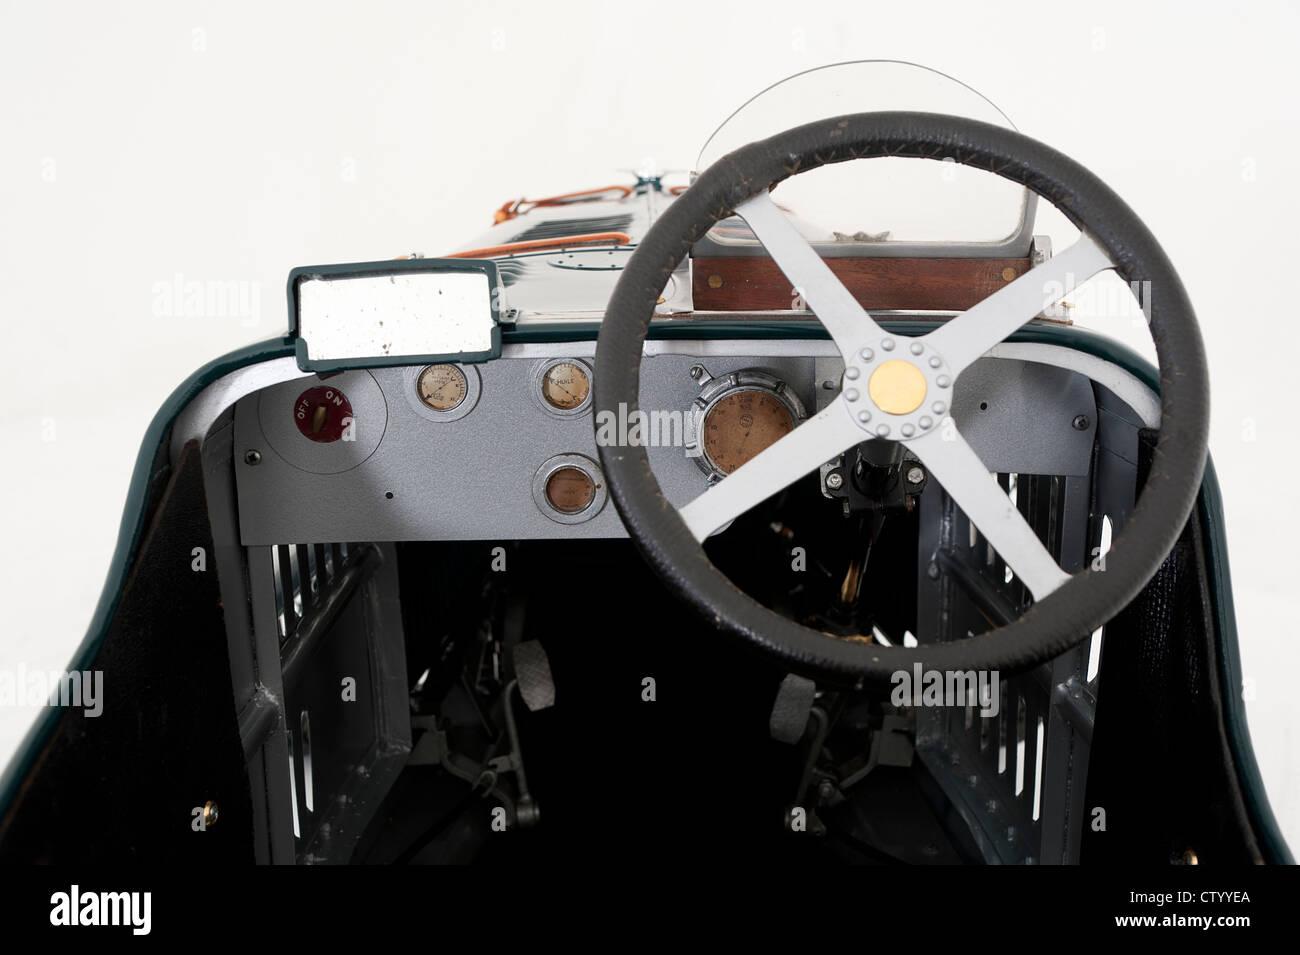 Cockpit of Sunbeam Cub motorised pedal car - Stock Image